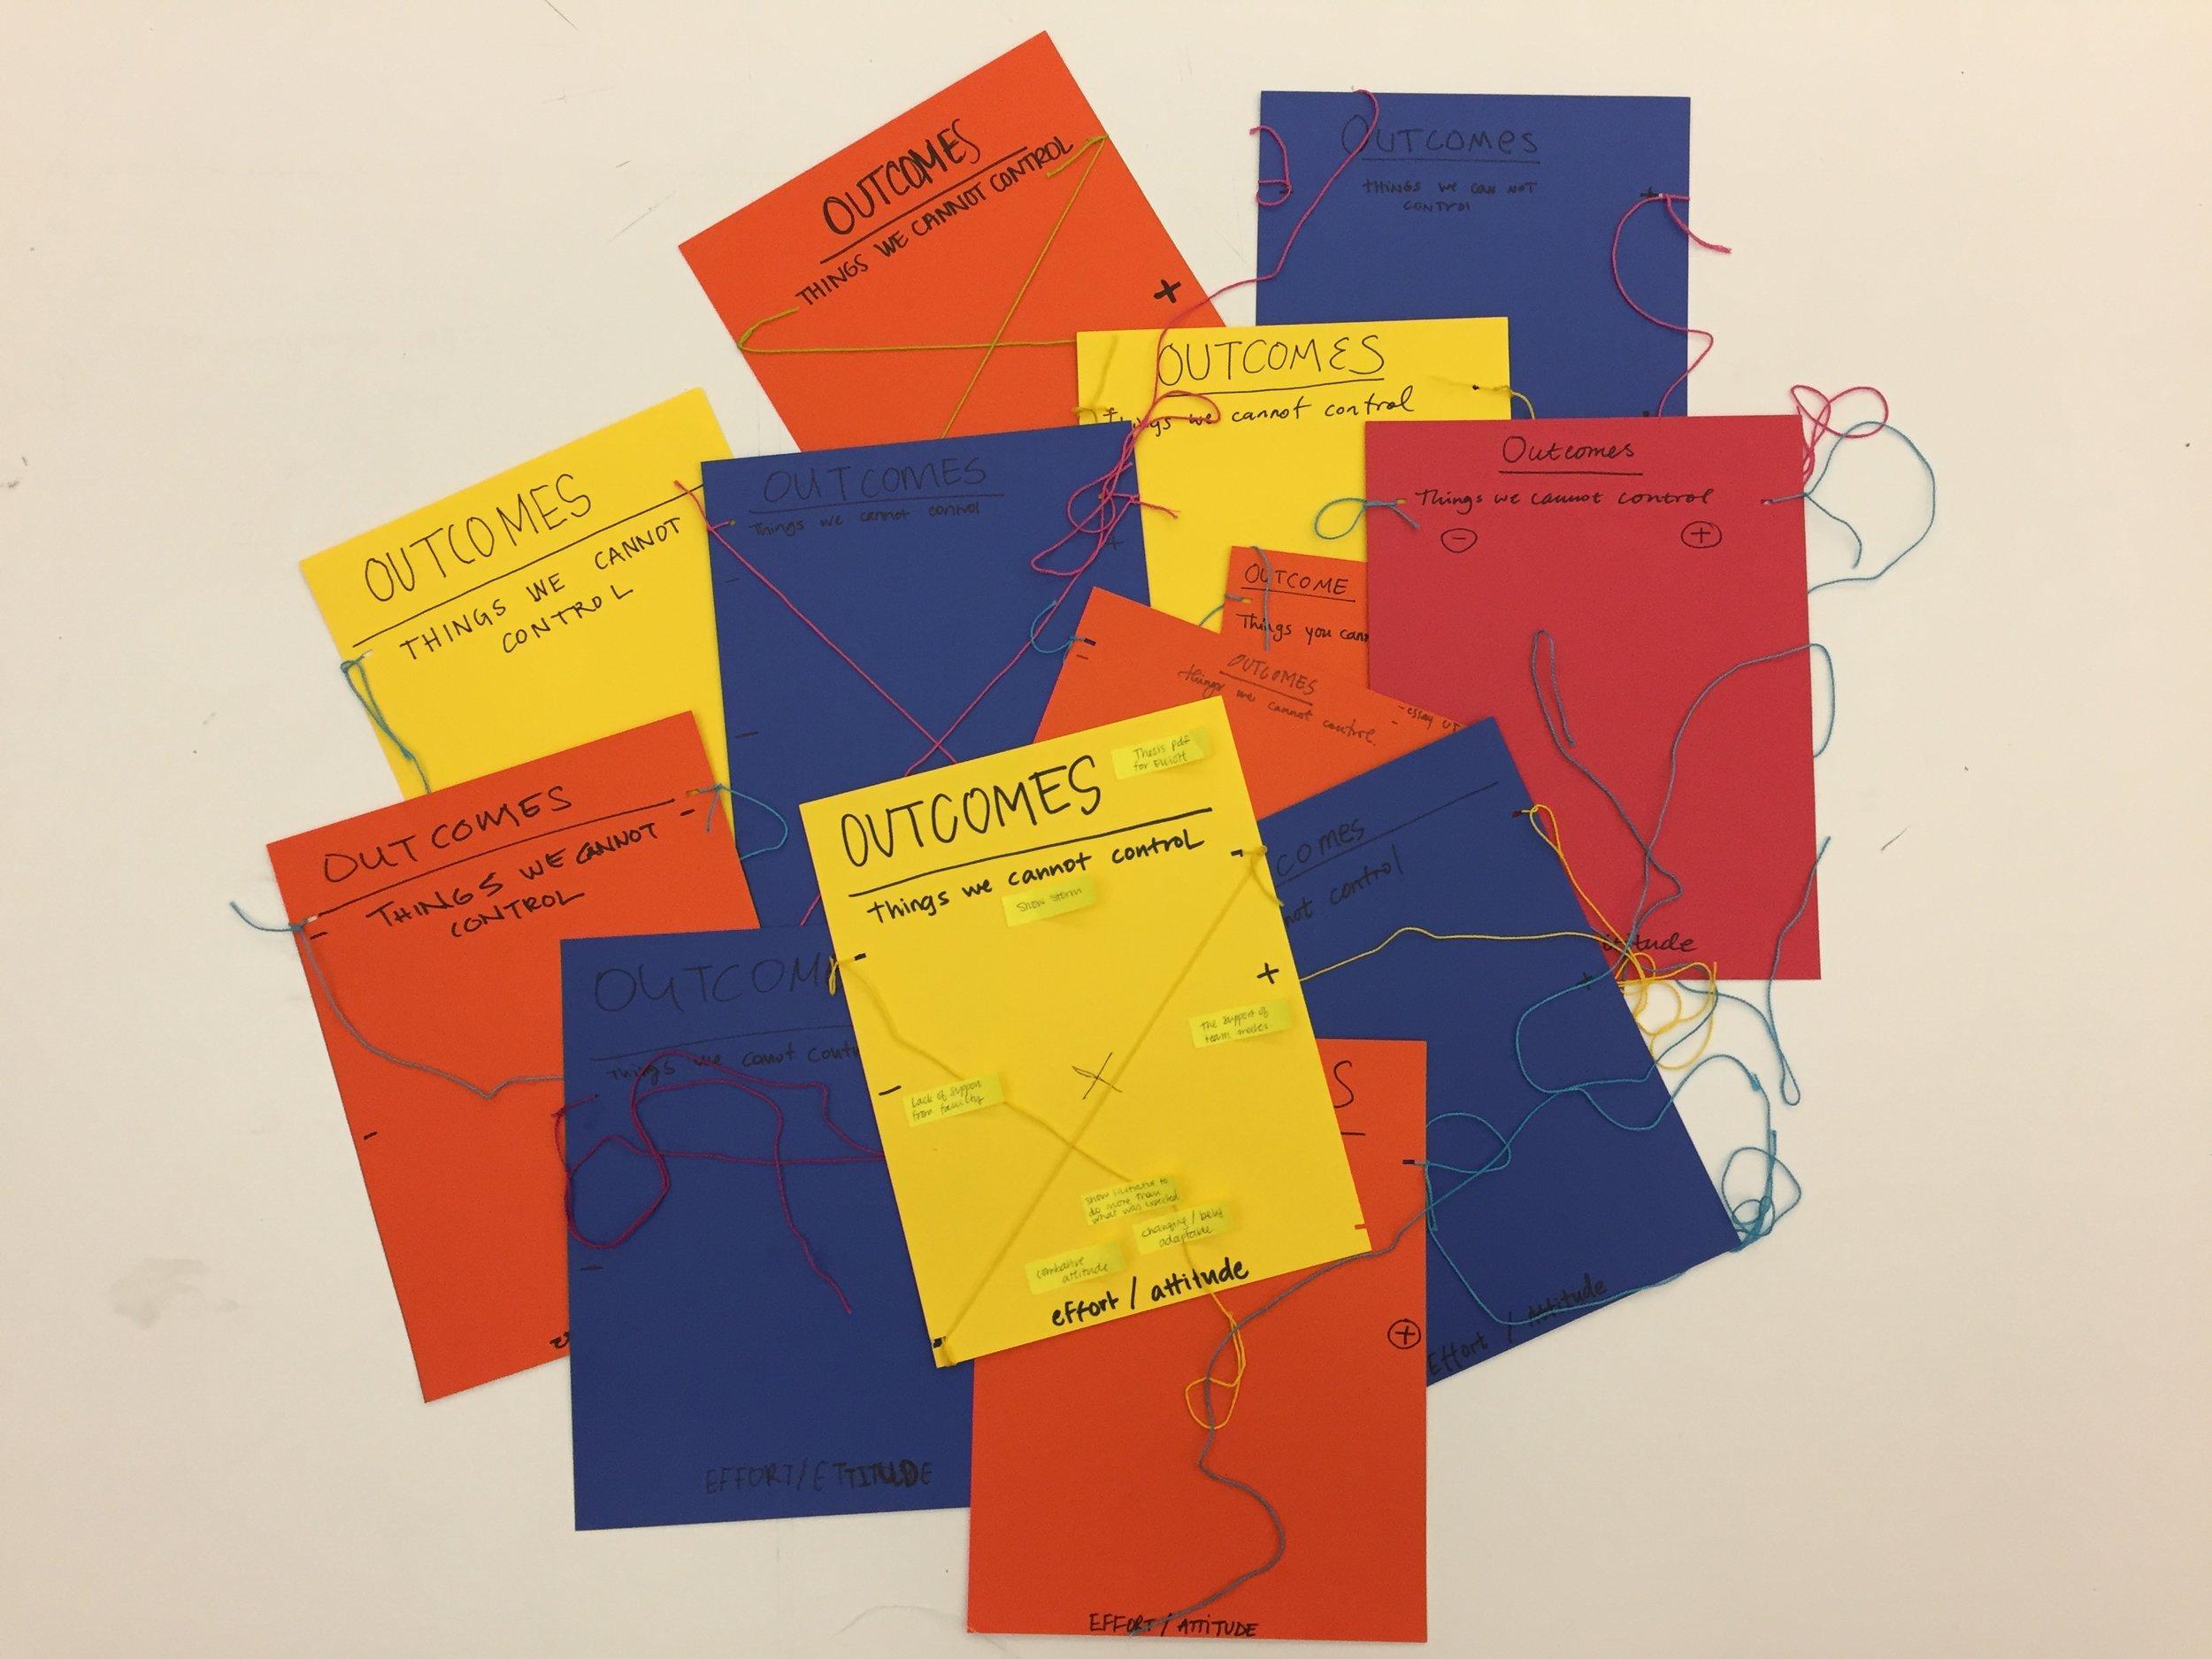 Instruments of Empowerment: Workshop Activity